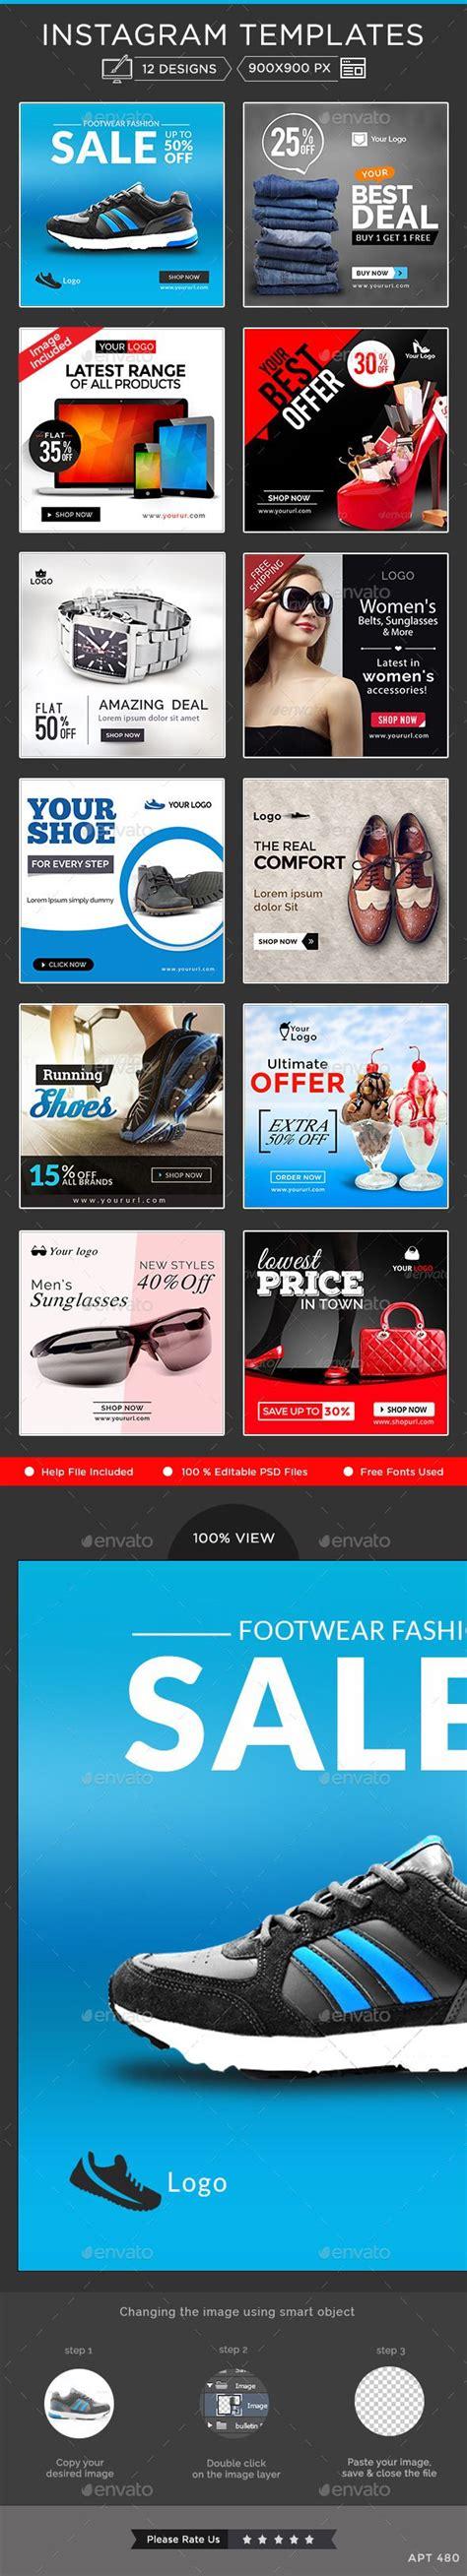 instagram banner templates 11 designs by ahfid instagram banner templates 12 designs banner template